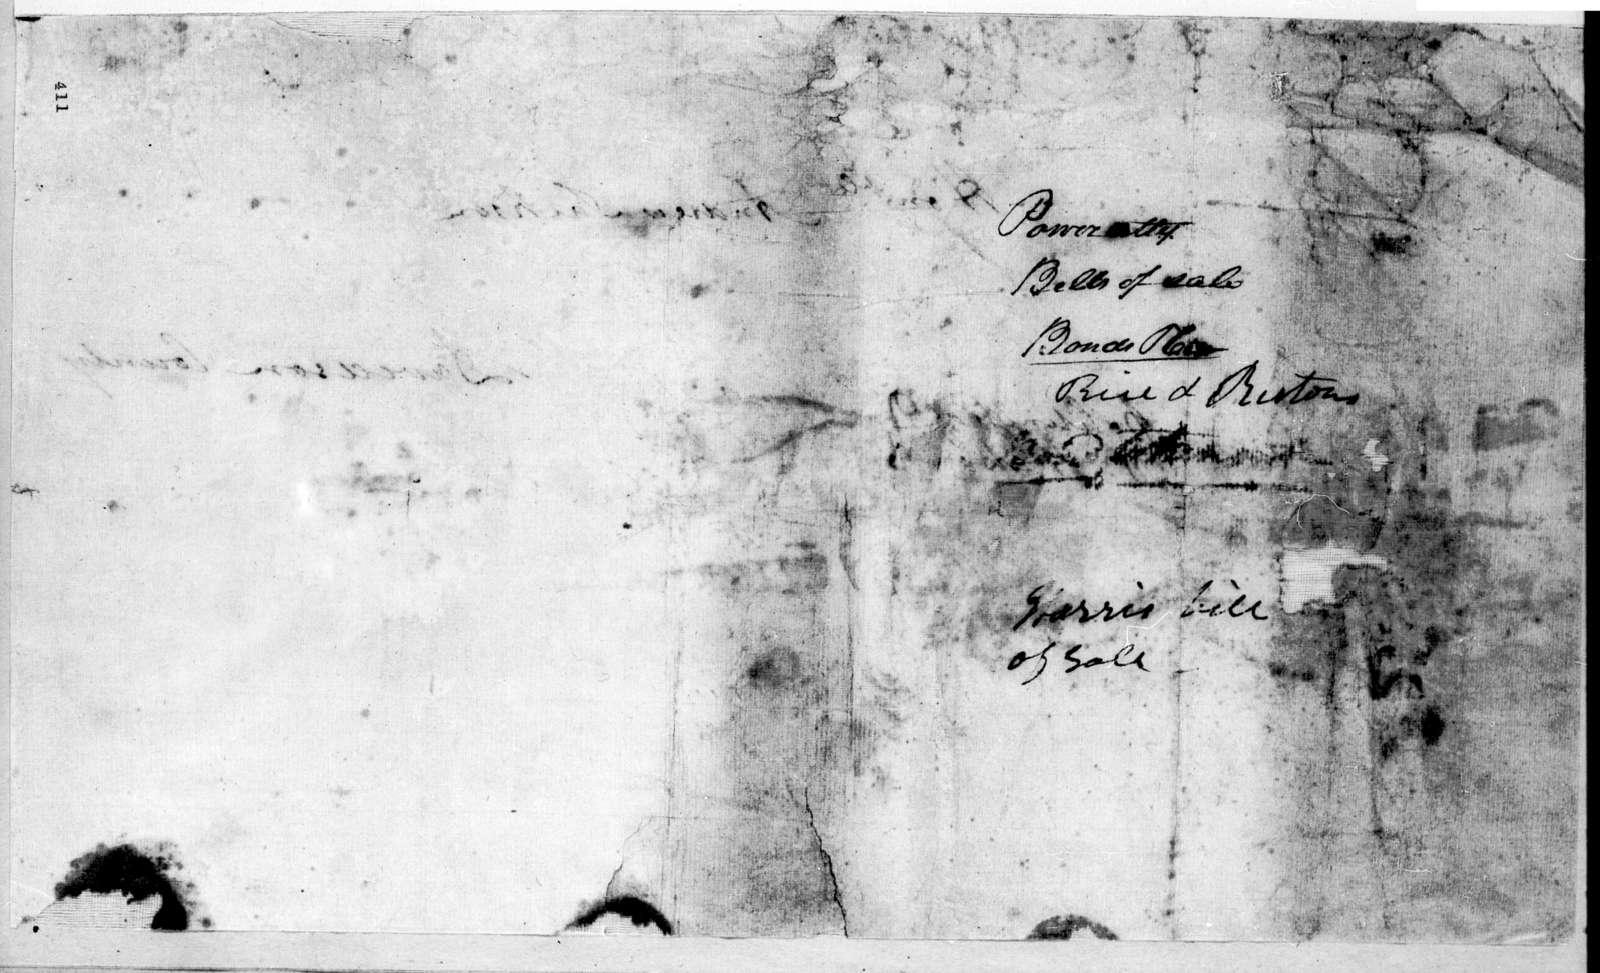 Archibald Roane to Andrew Jackson, July 22, 1803